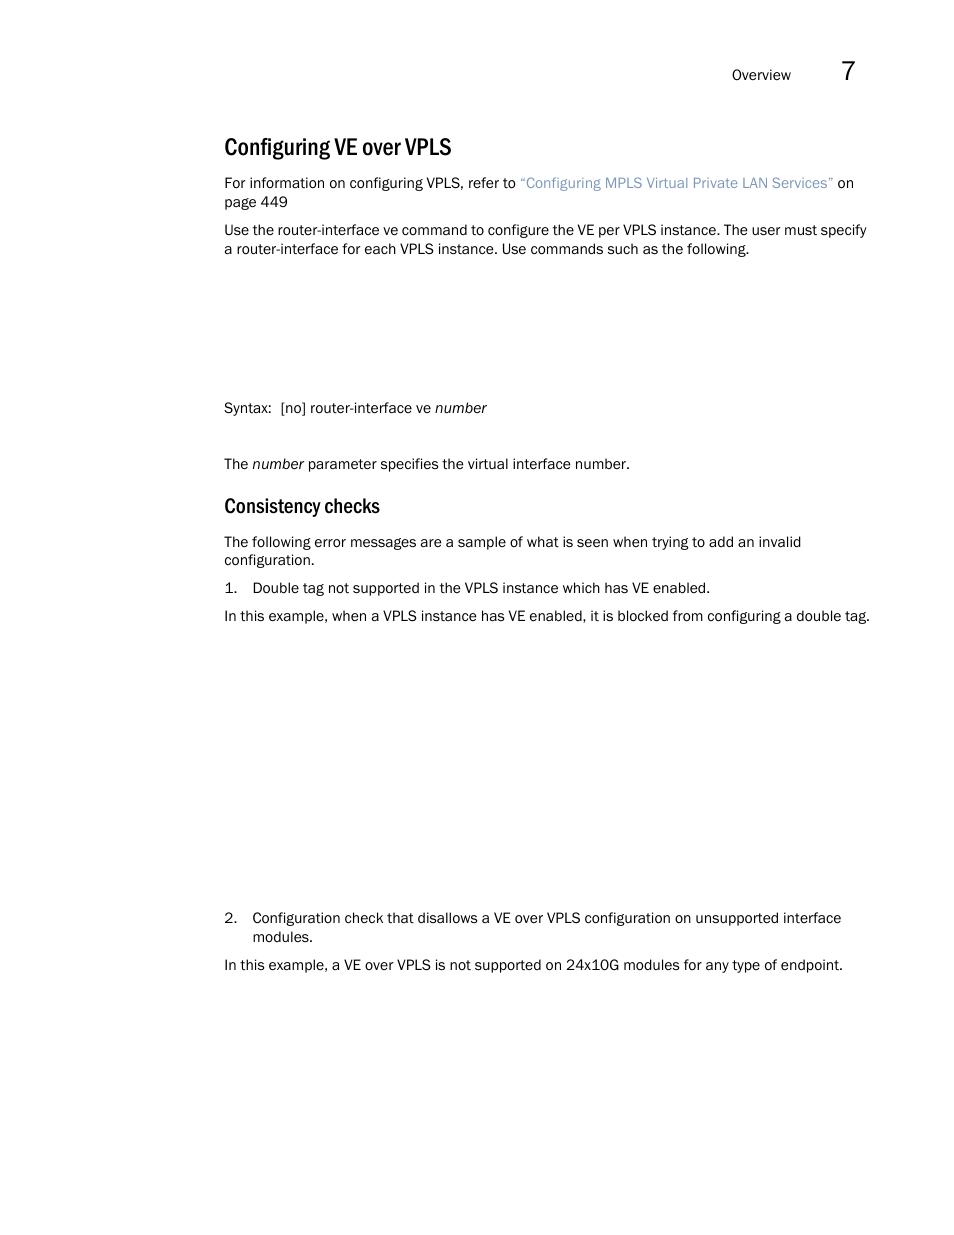 Configuring ve over vpls, Consistency checks | Brocade Multi-Service